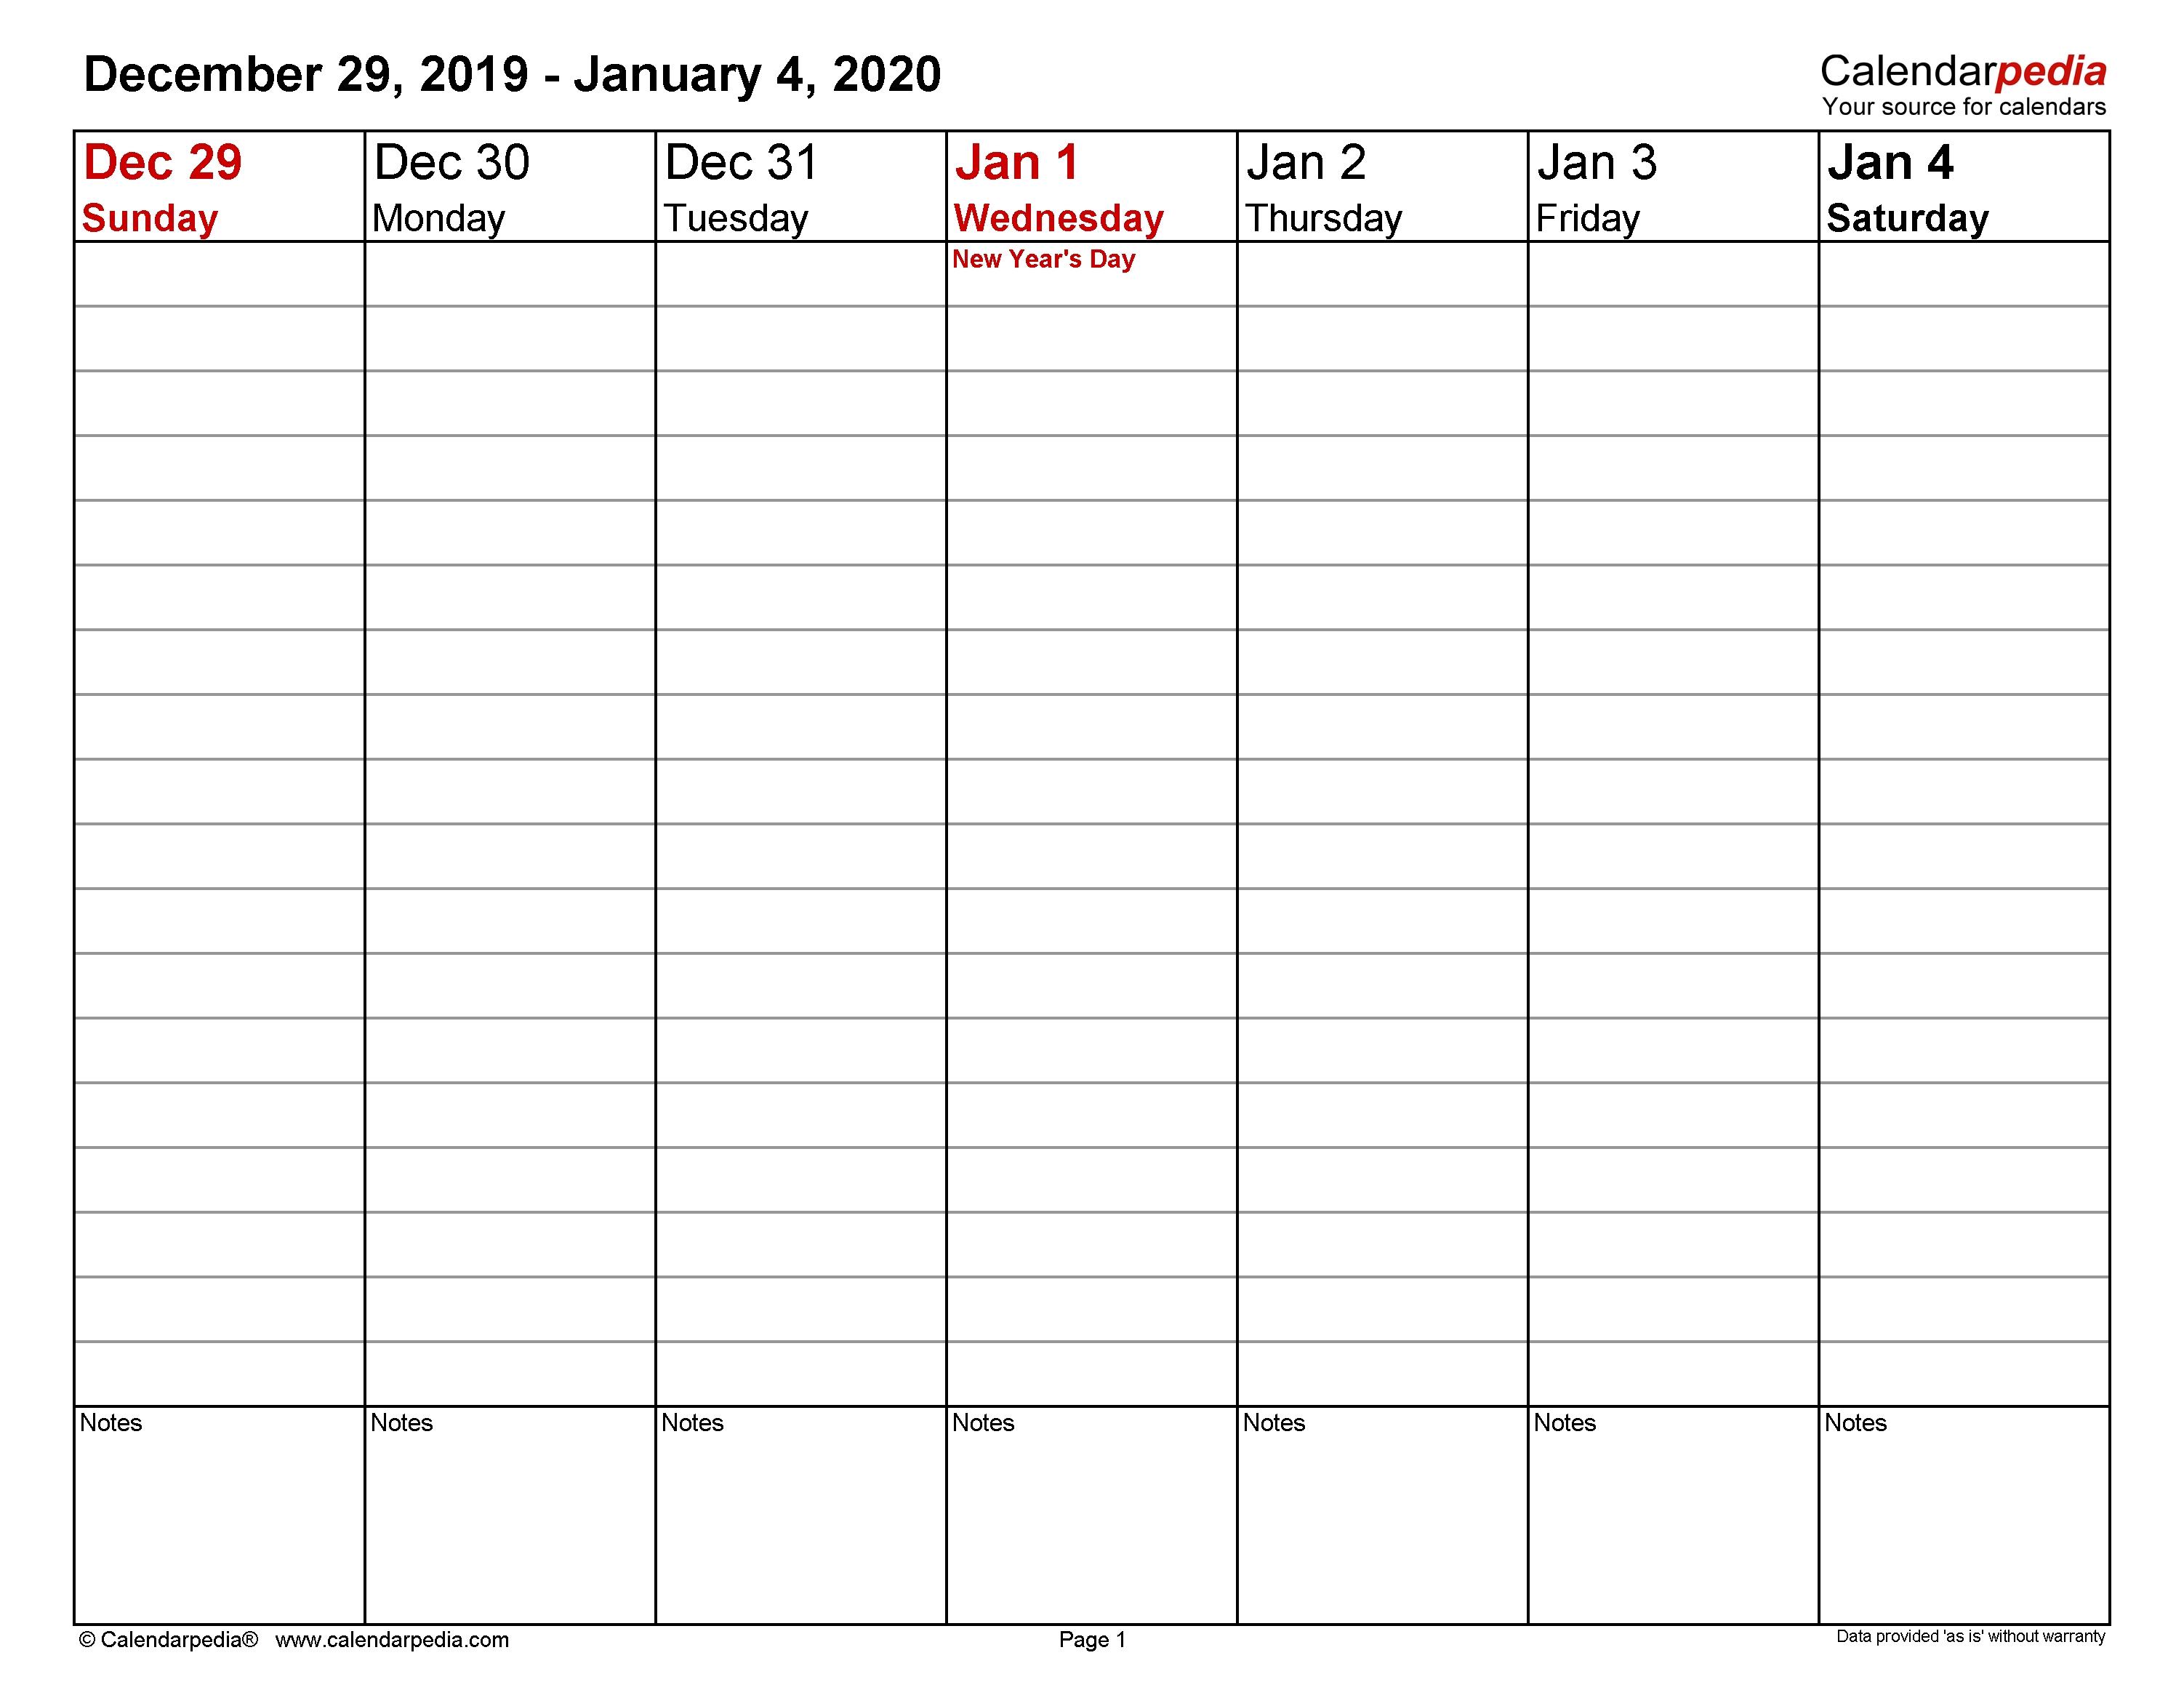 Weekly Calendars 2020 For Word - 12 Free Printable Templates for Free Printable One Week Calendar 2020